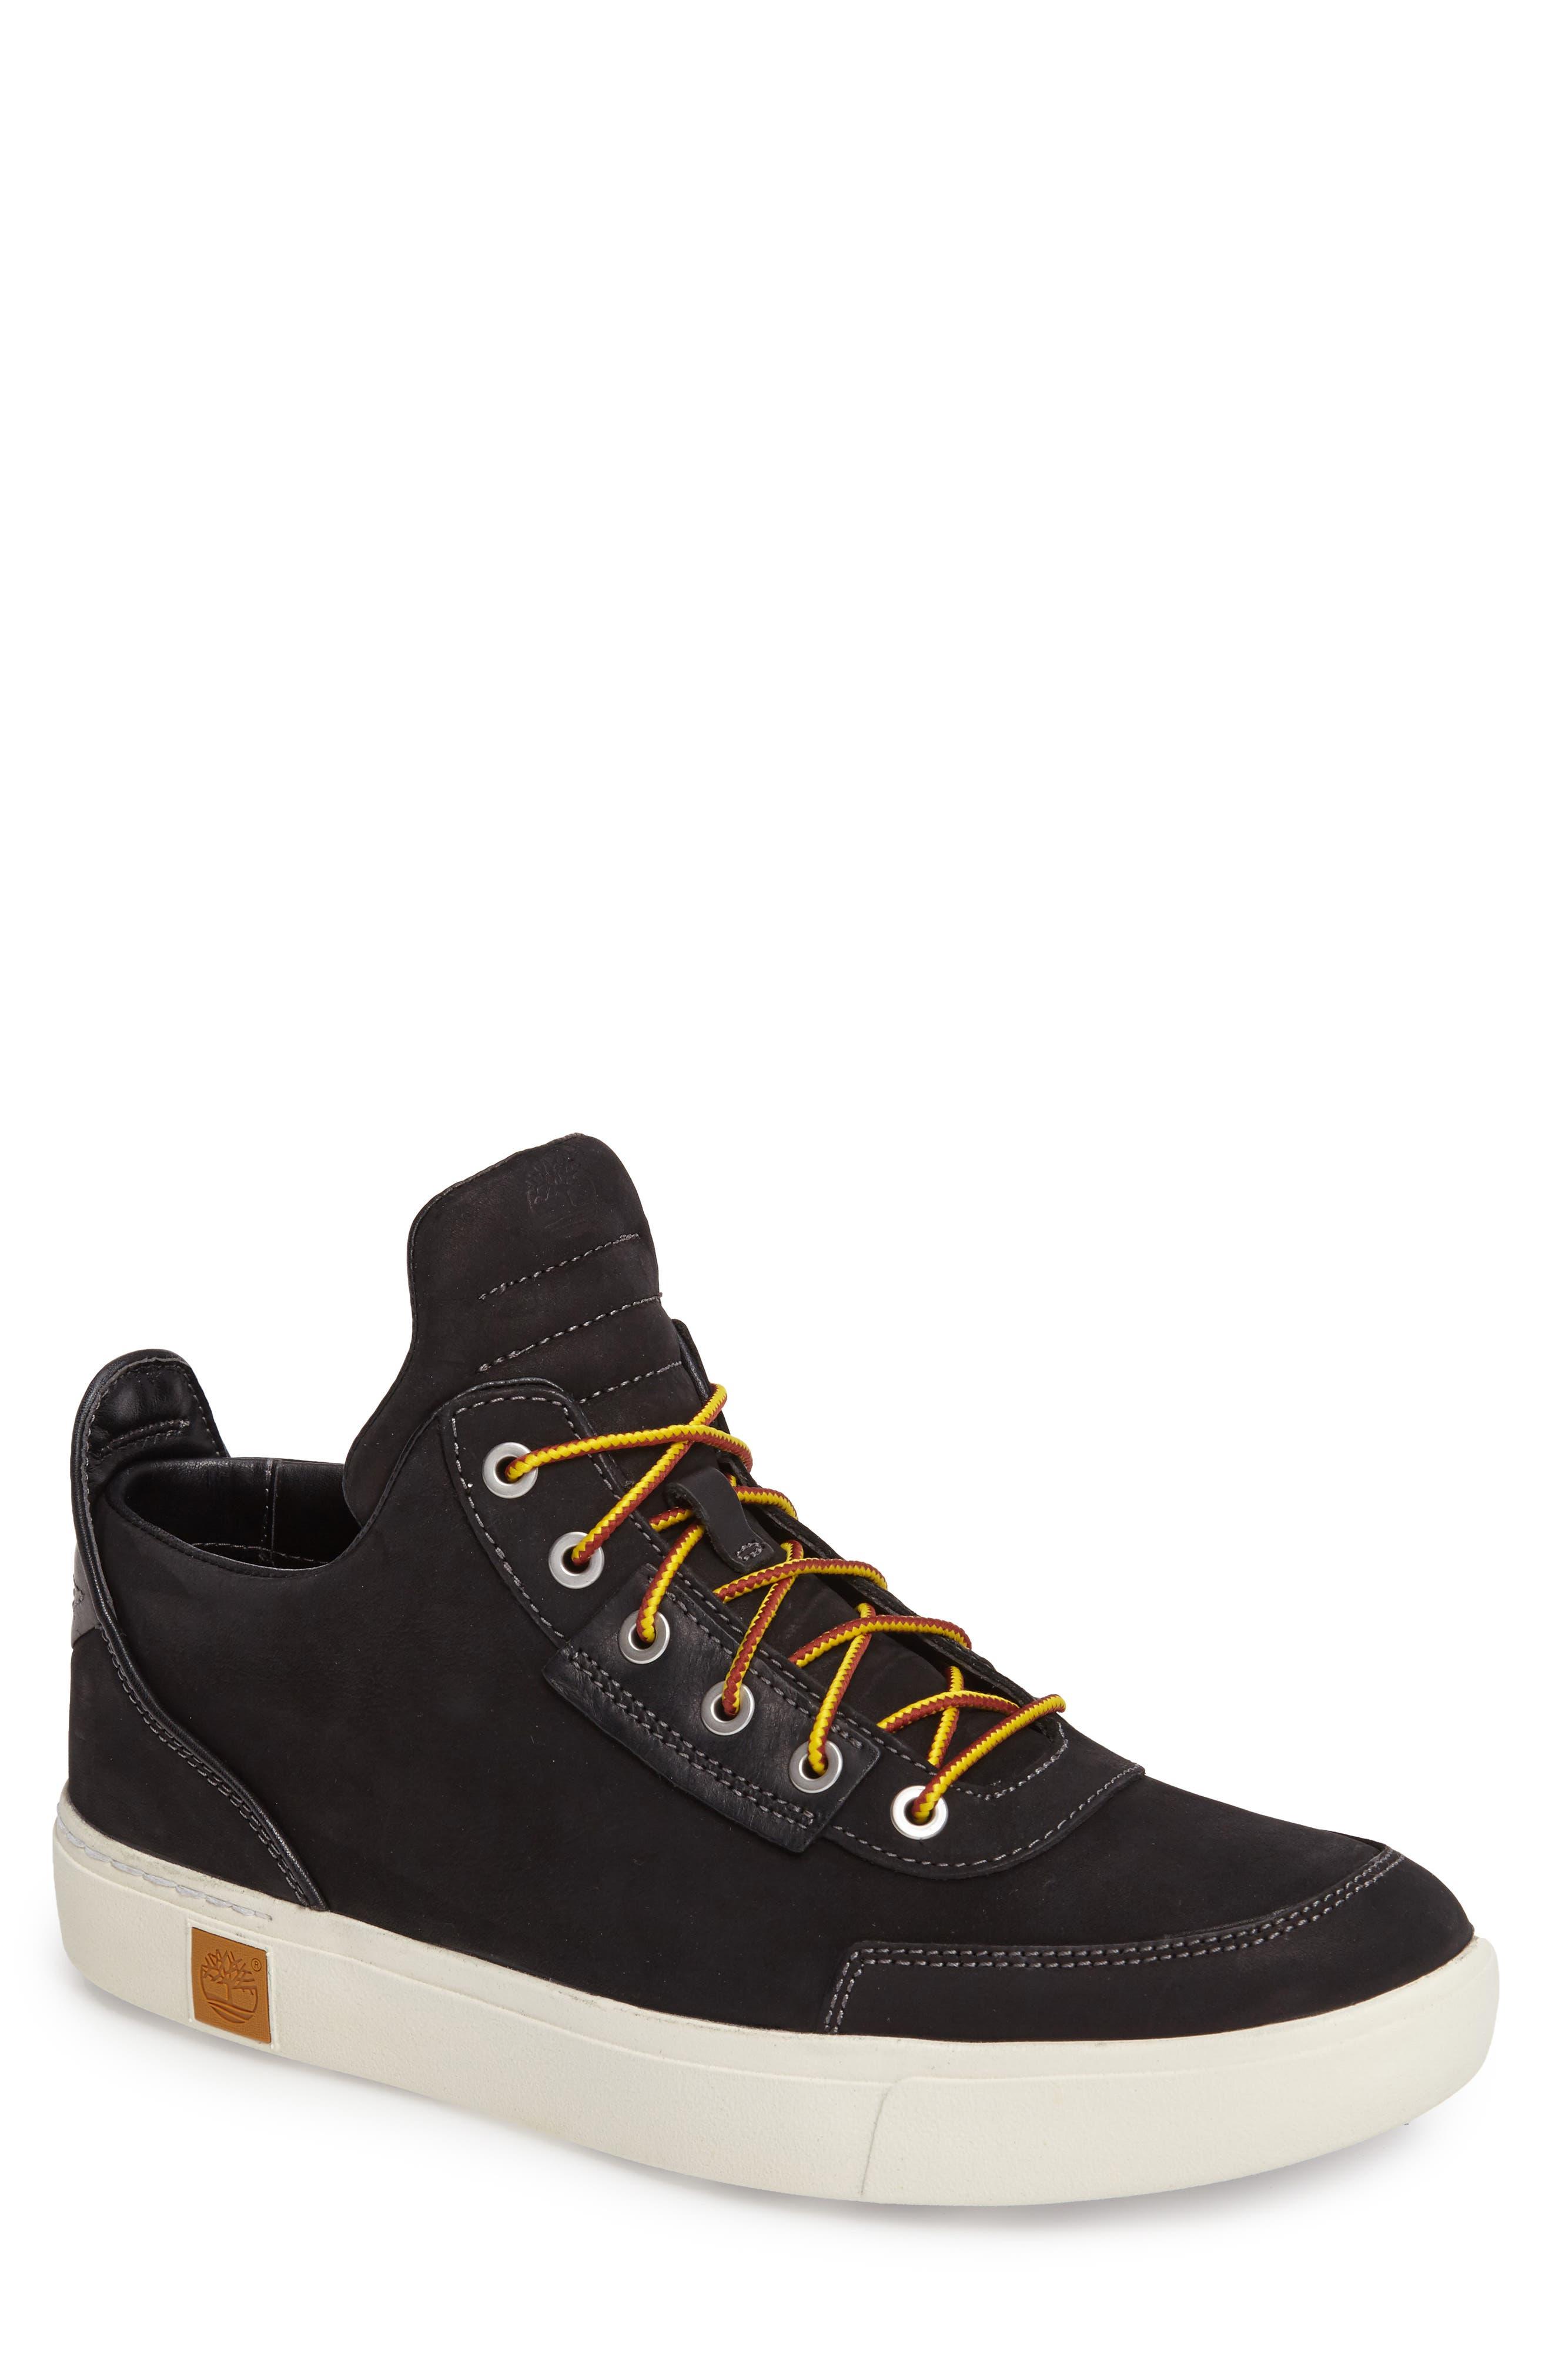 Amherst Chukka Sneaker, Main, color, 001